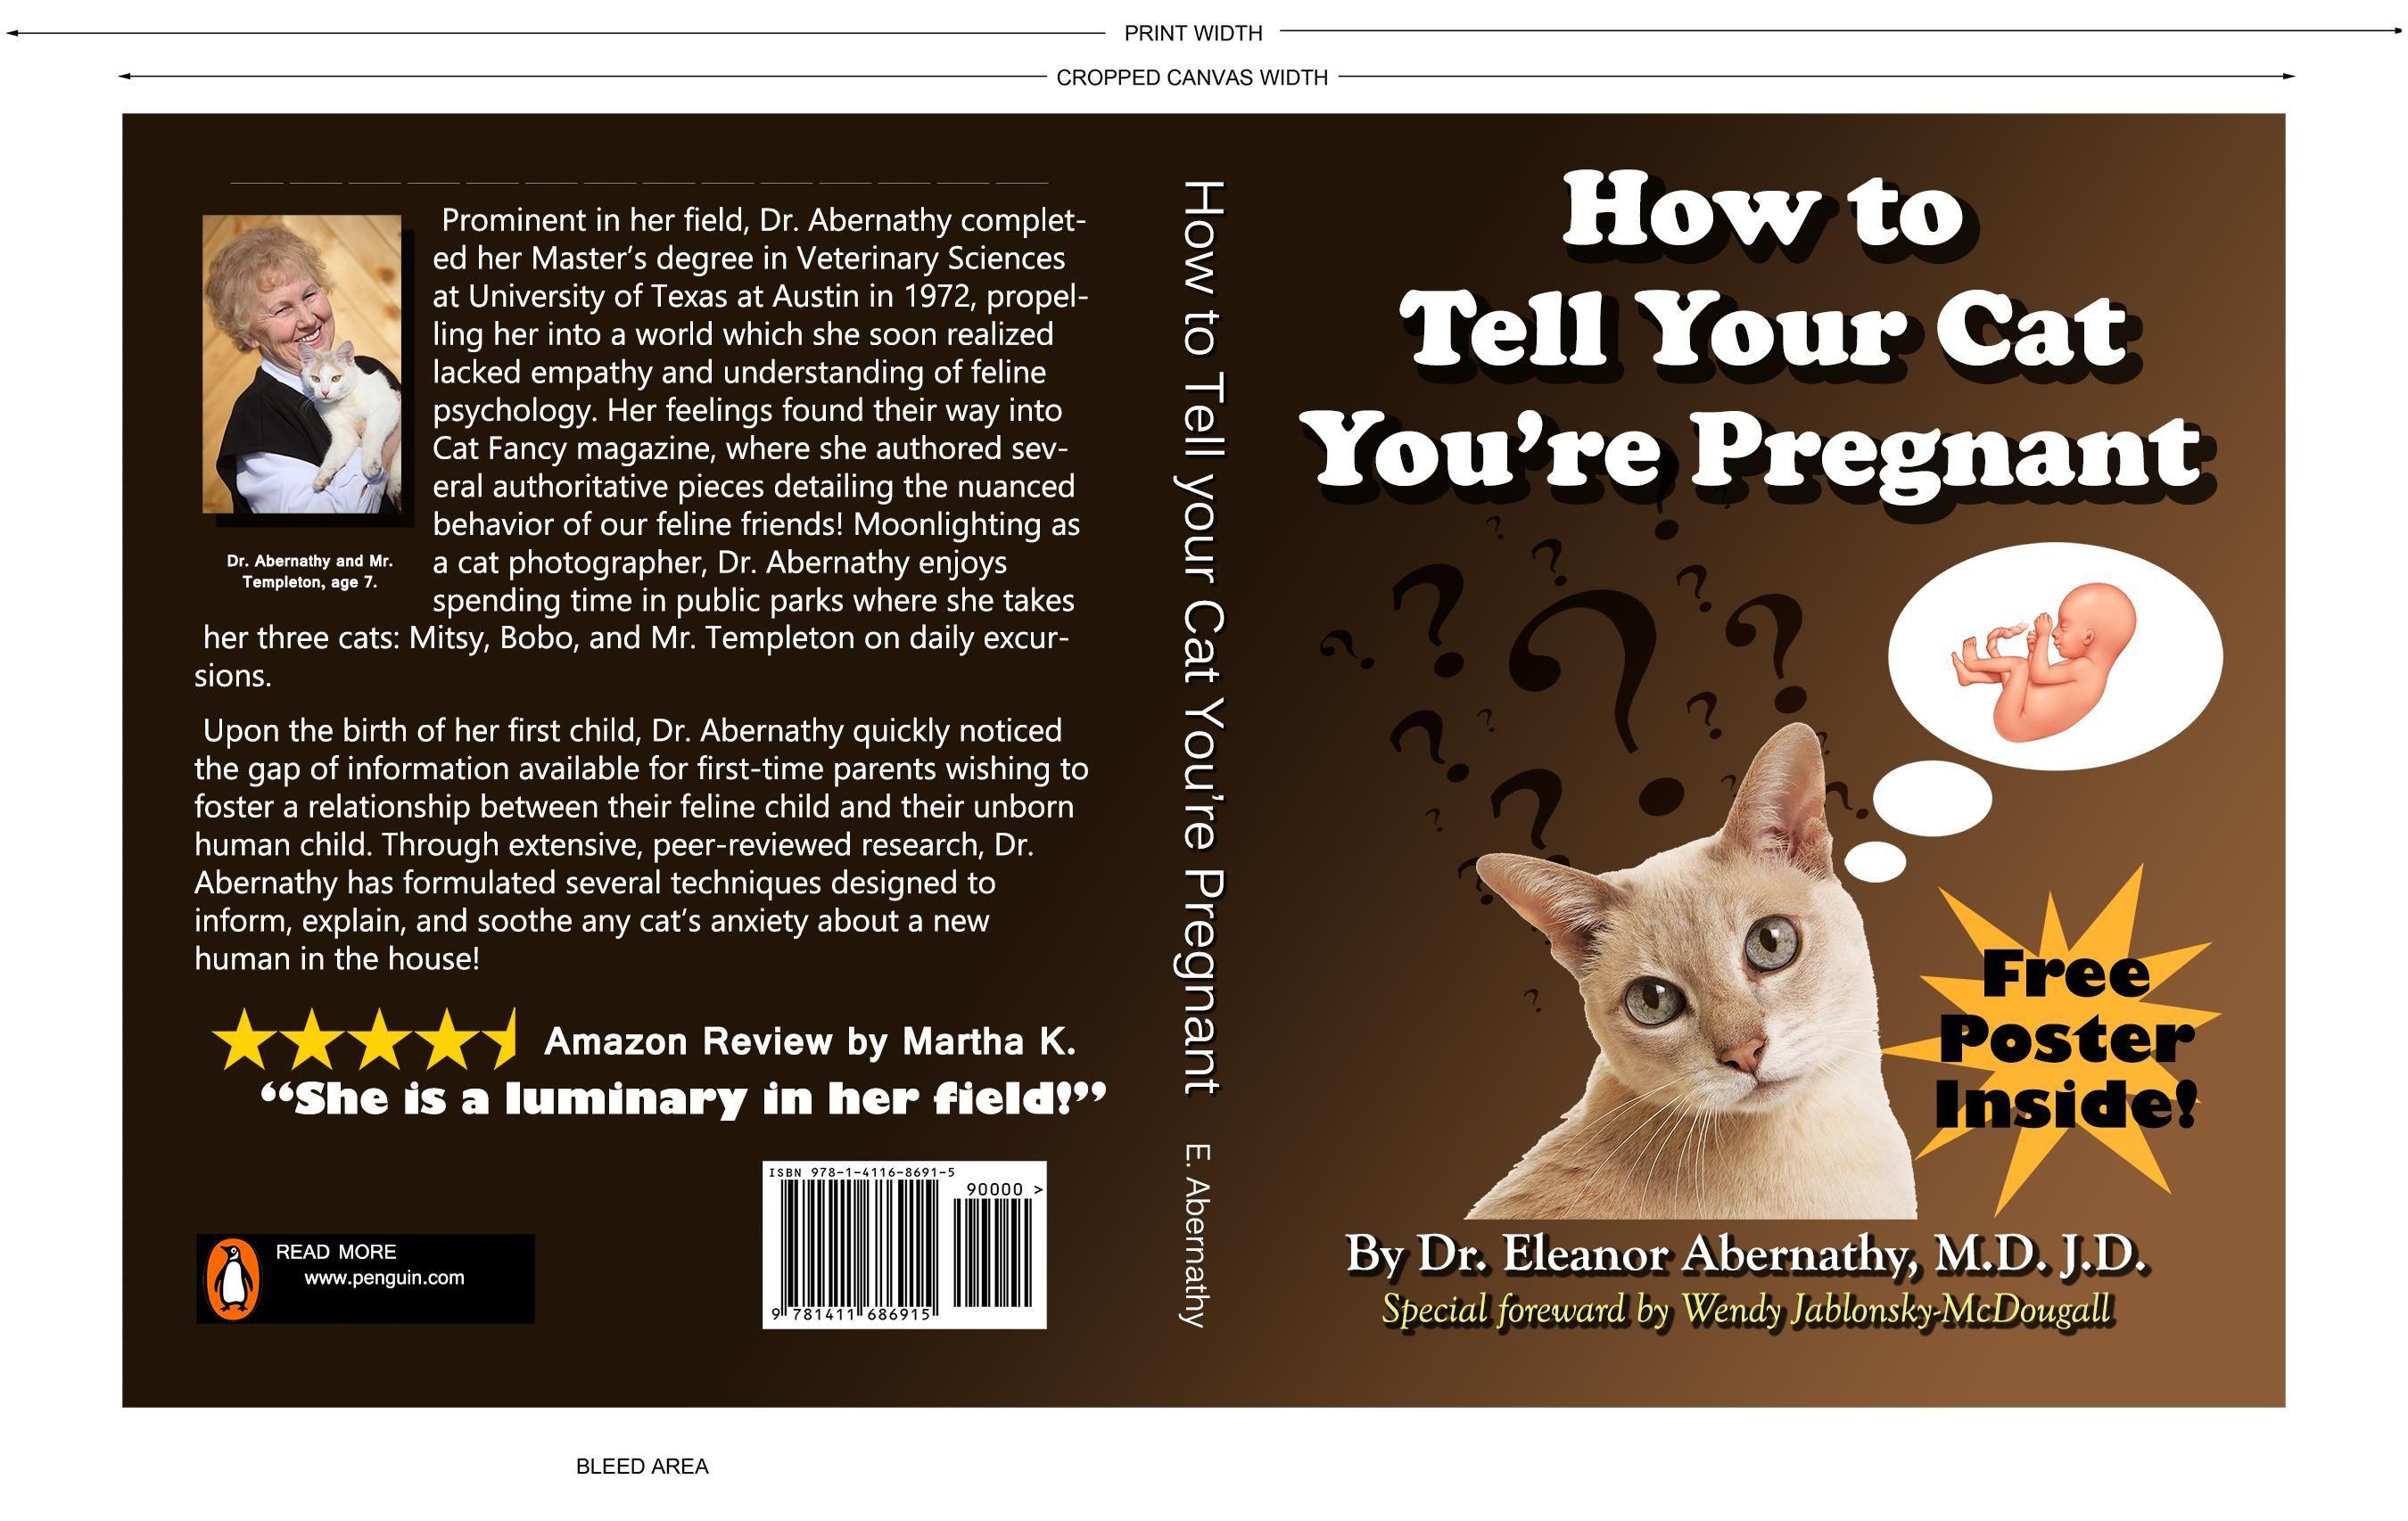 Baby Announcement Baby Announcement Baby Fever Cat Adoption